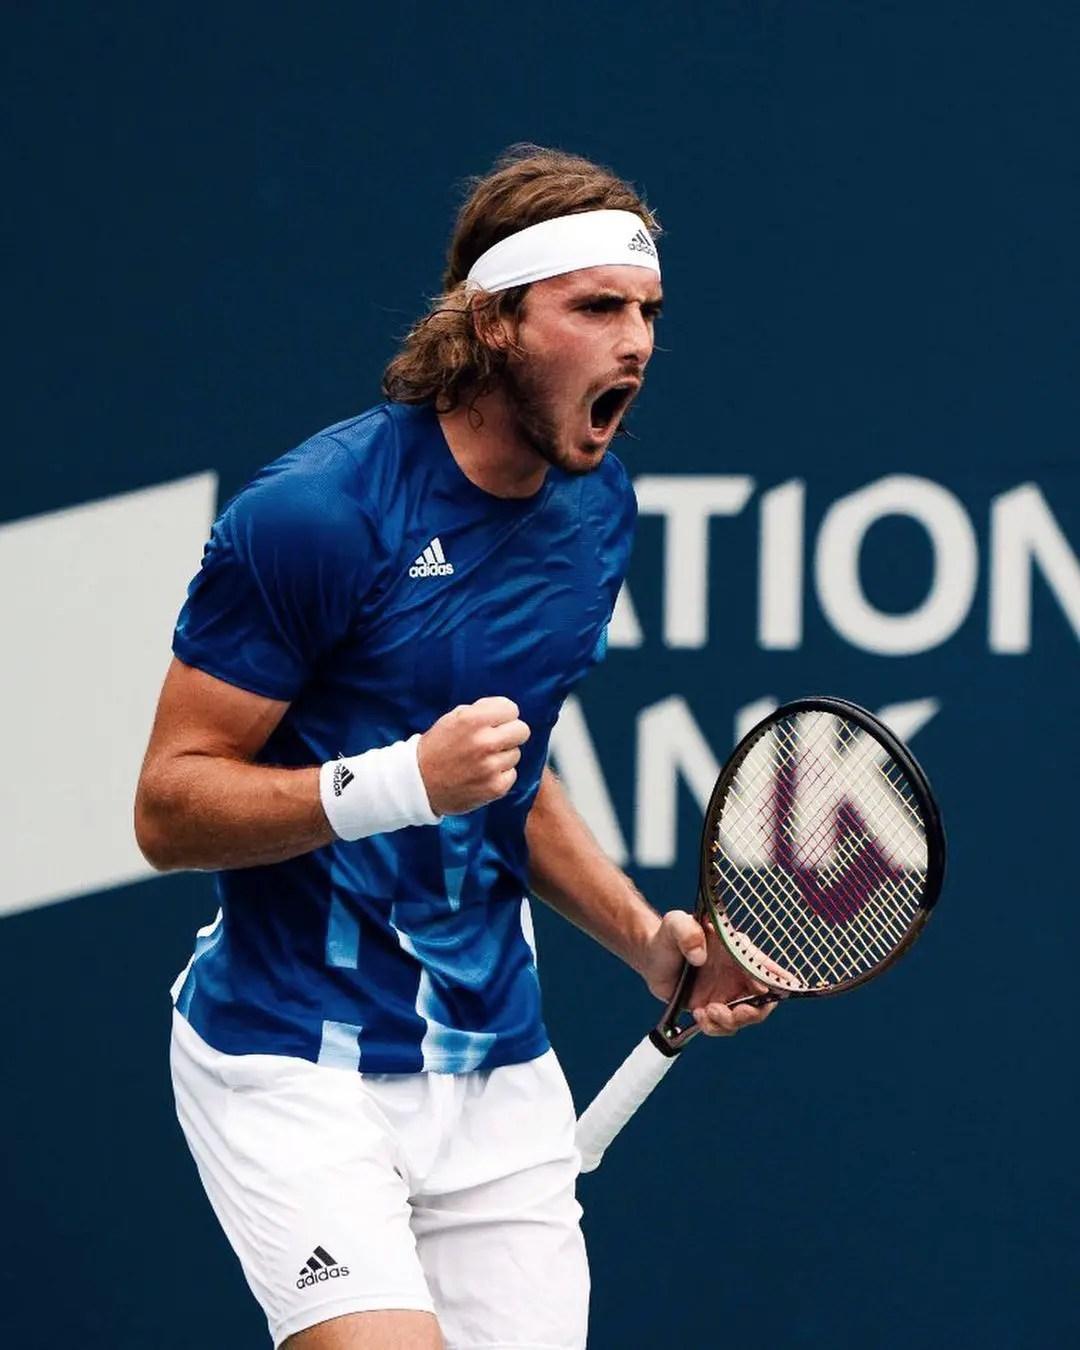 ATP Tour: 'Why I Haven't Taken Covid-19 Vaccine'  –Tsitsipas